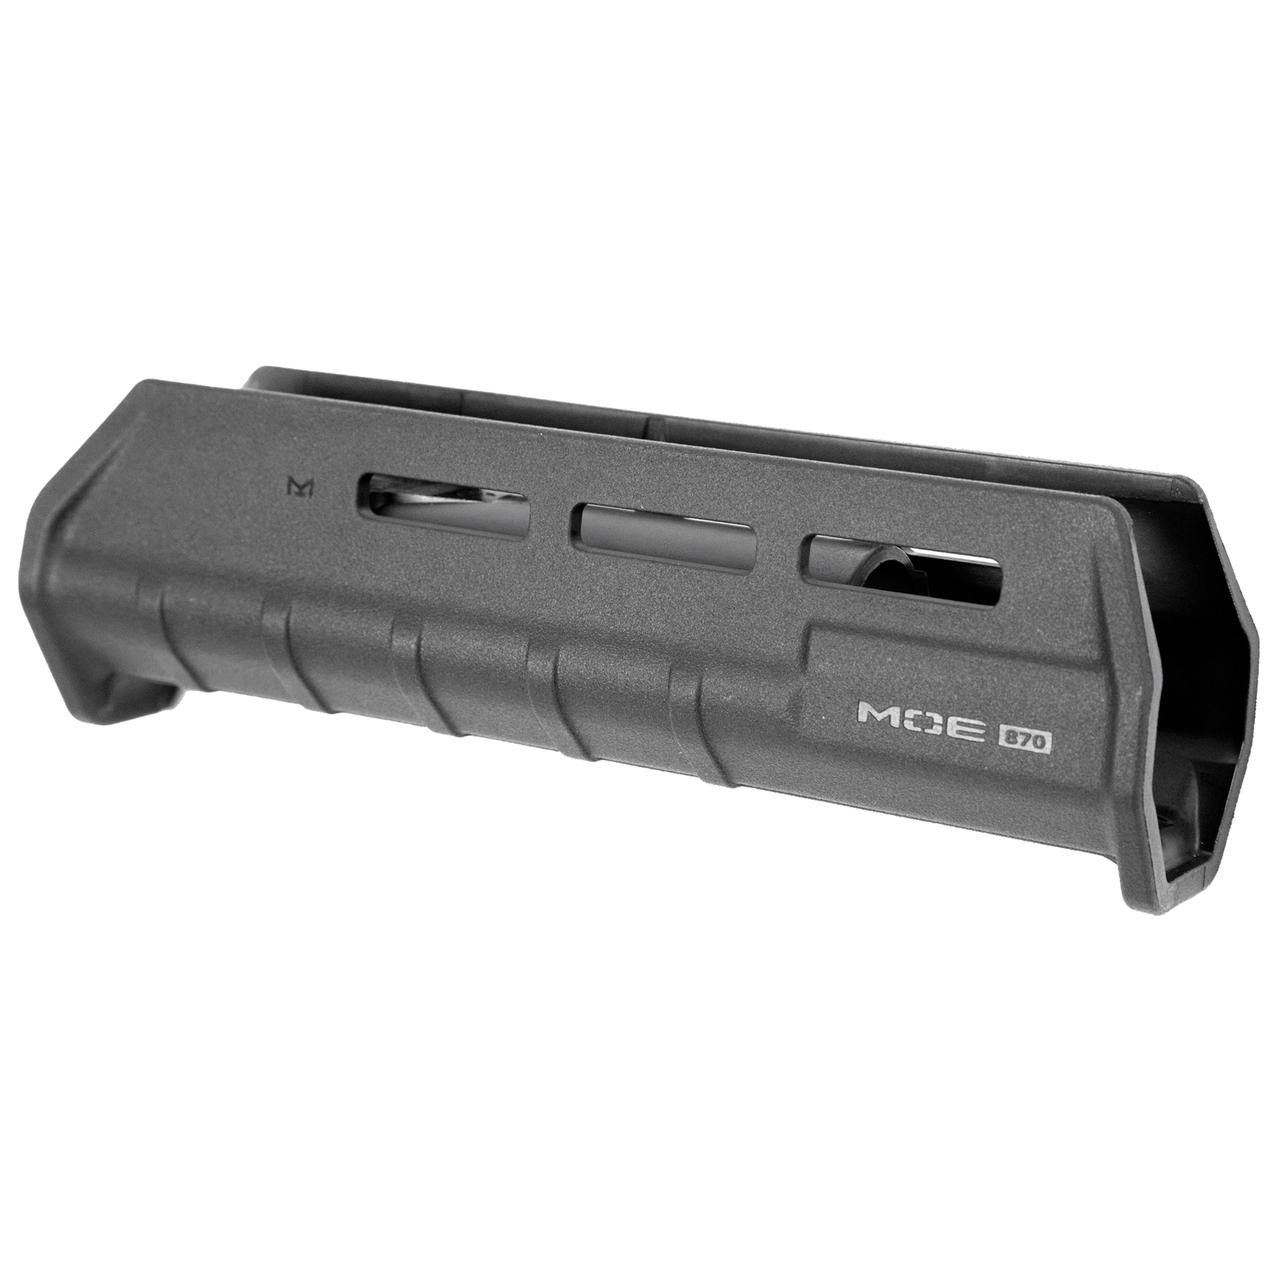 Magpul MOE M-LOK Forend Remington 870 Black